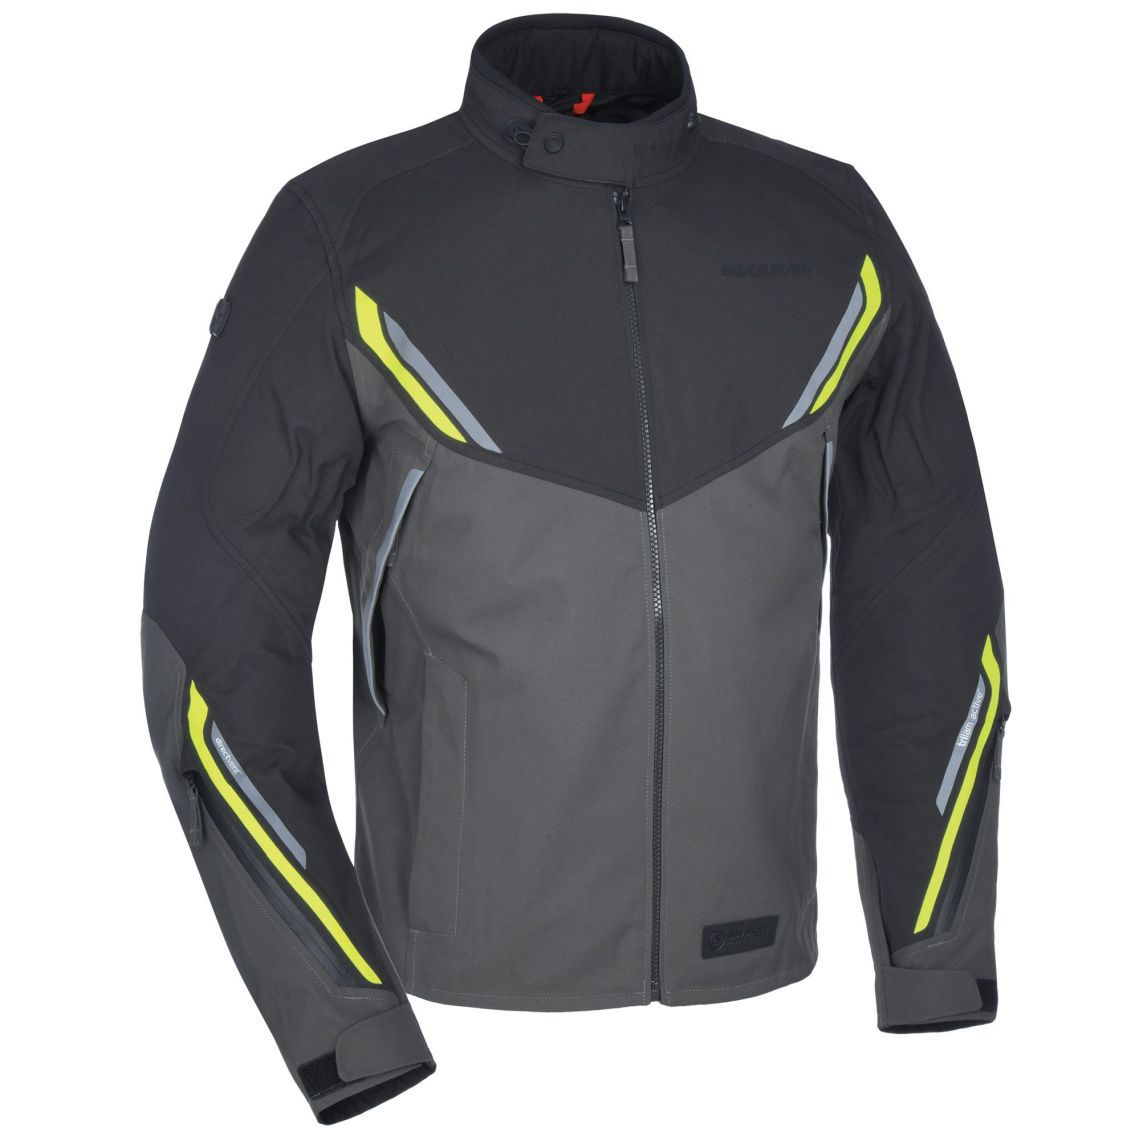 Oxford-hinterland-jacket